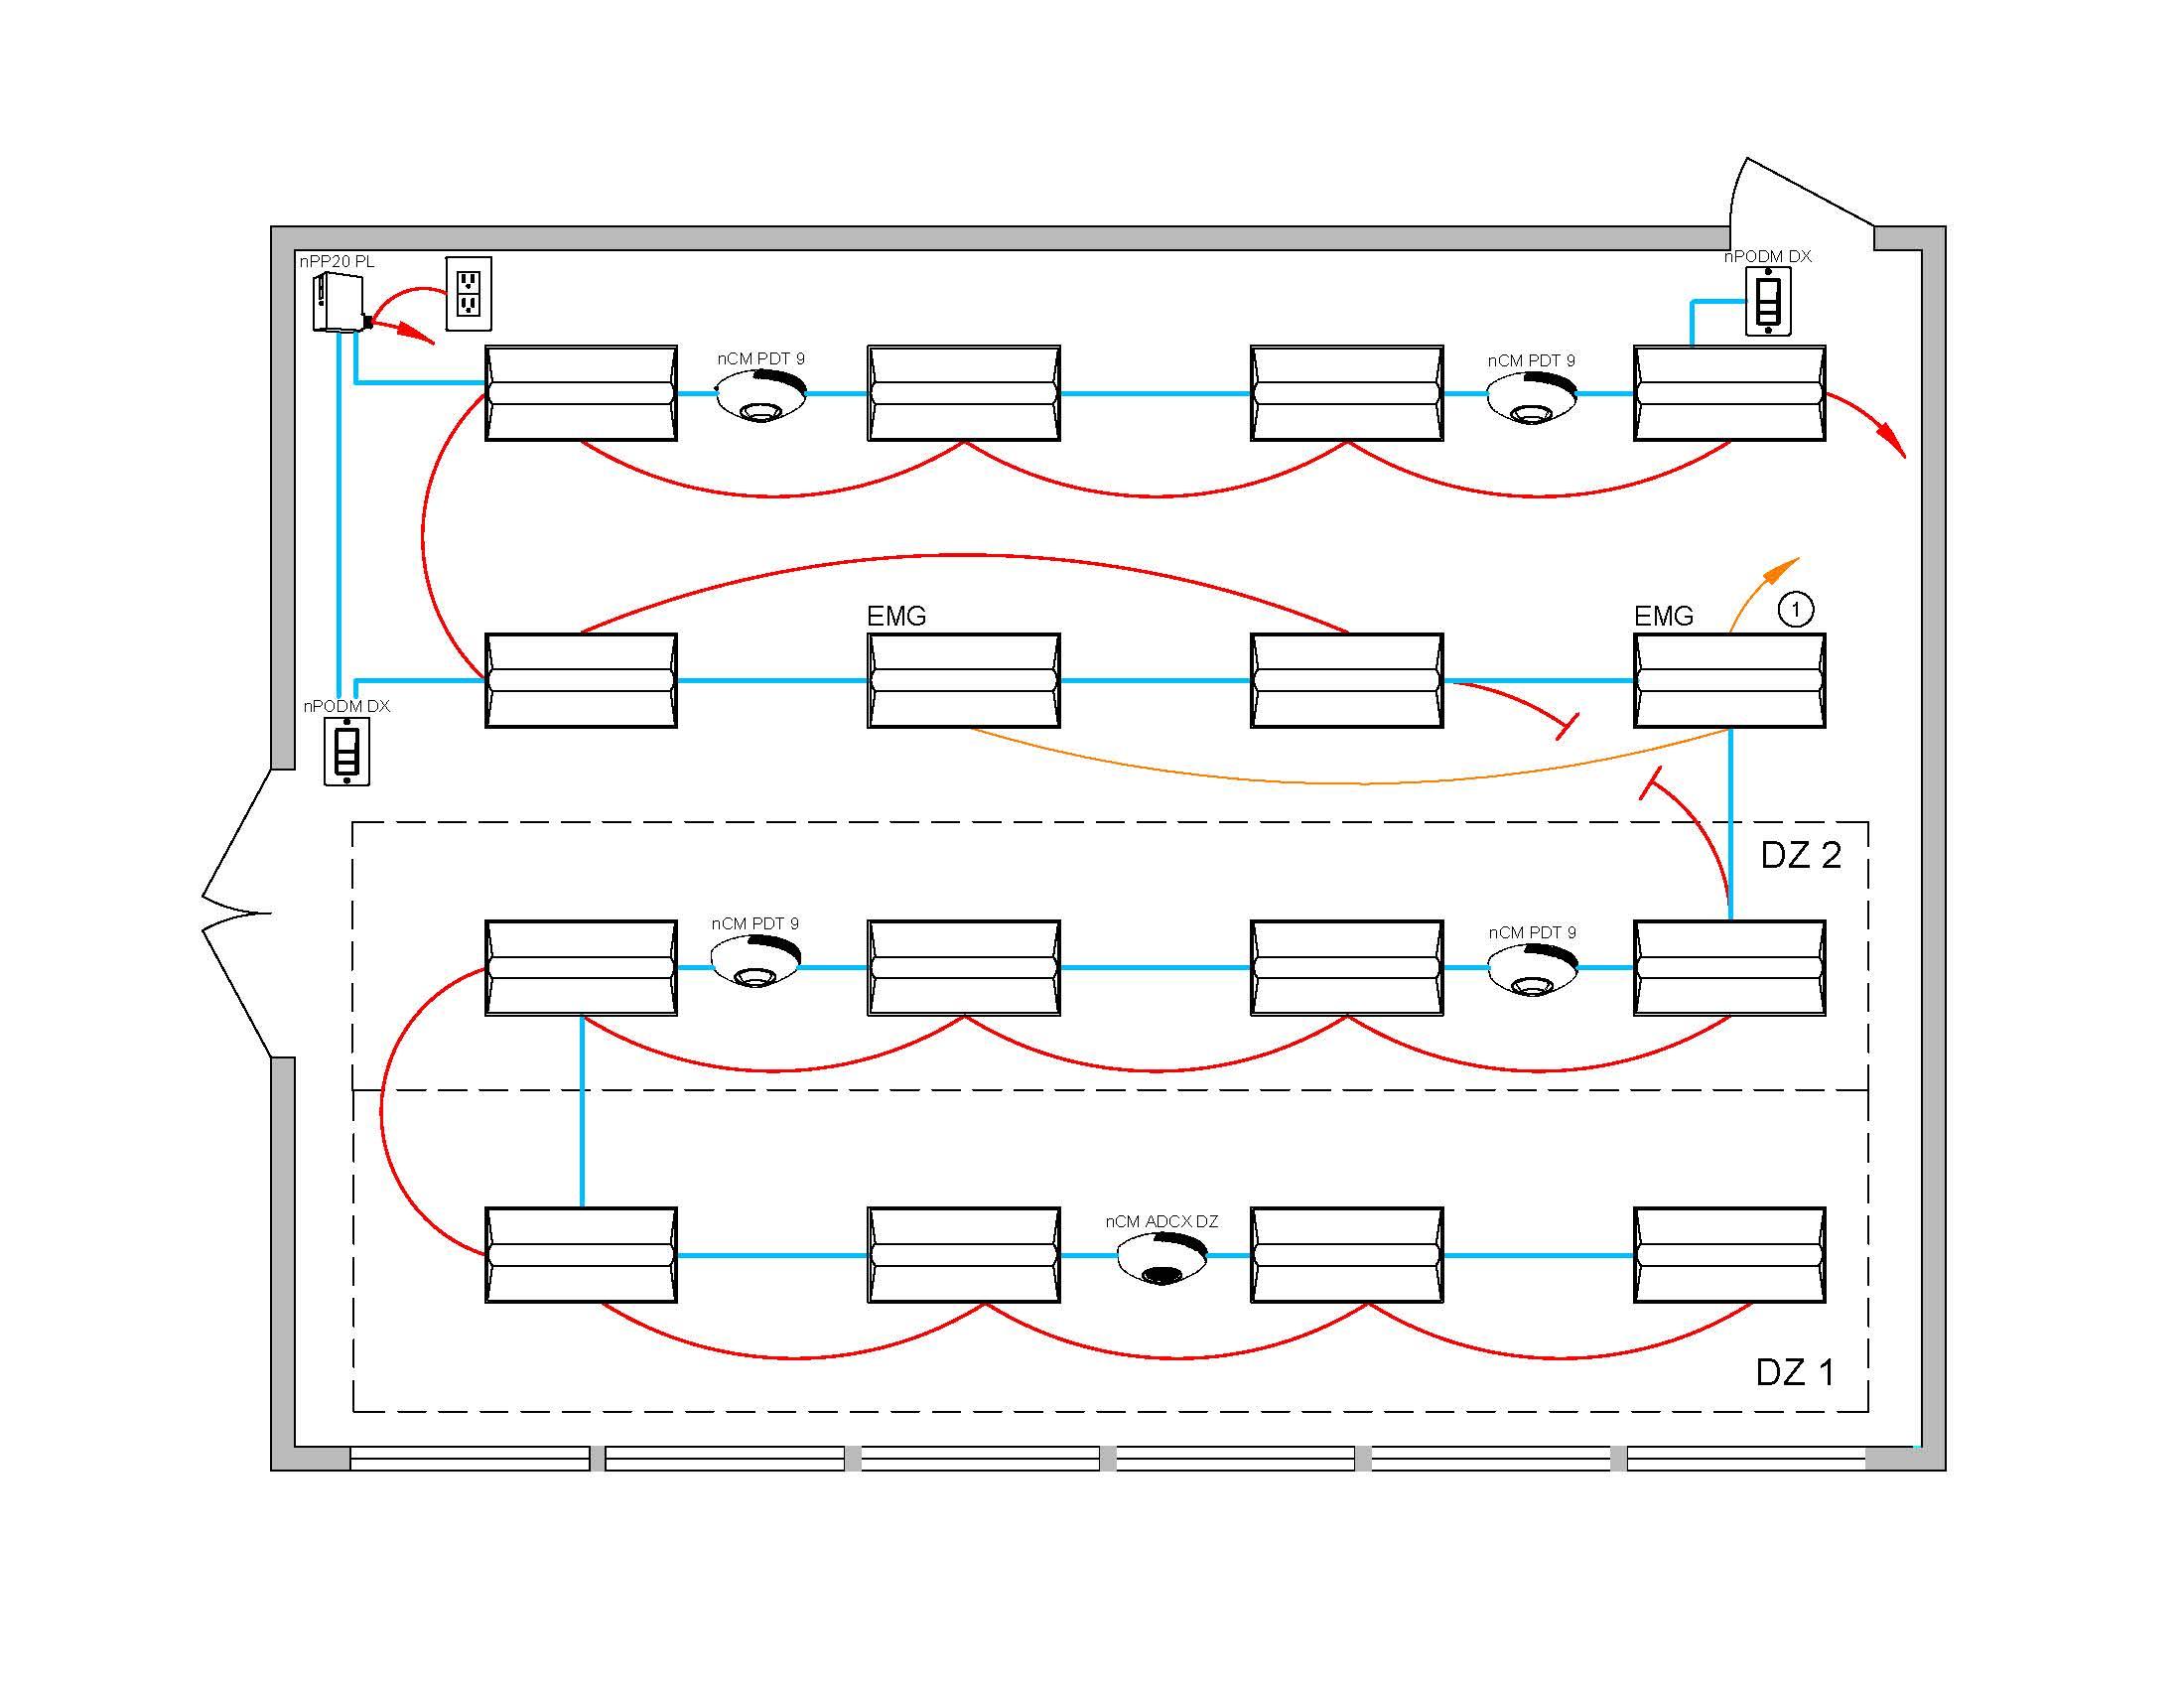 N Light Wiring Diagram | Wiring Diagram on advance transformer wiring diagram, led light fixture wiring diagram, ballast wiring diagram, photocell wiring diagram, dali wiring diagram, halo lamp wiring diagram, dmx wiring diagram, recessed lighting wiring diagram, bodine electric wiring diagram, emergency lighting wiring diagram, daylight harvesting wiring diagram,